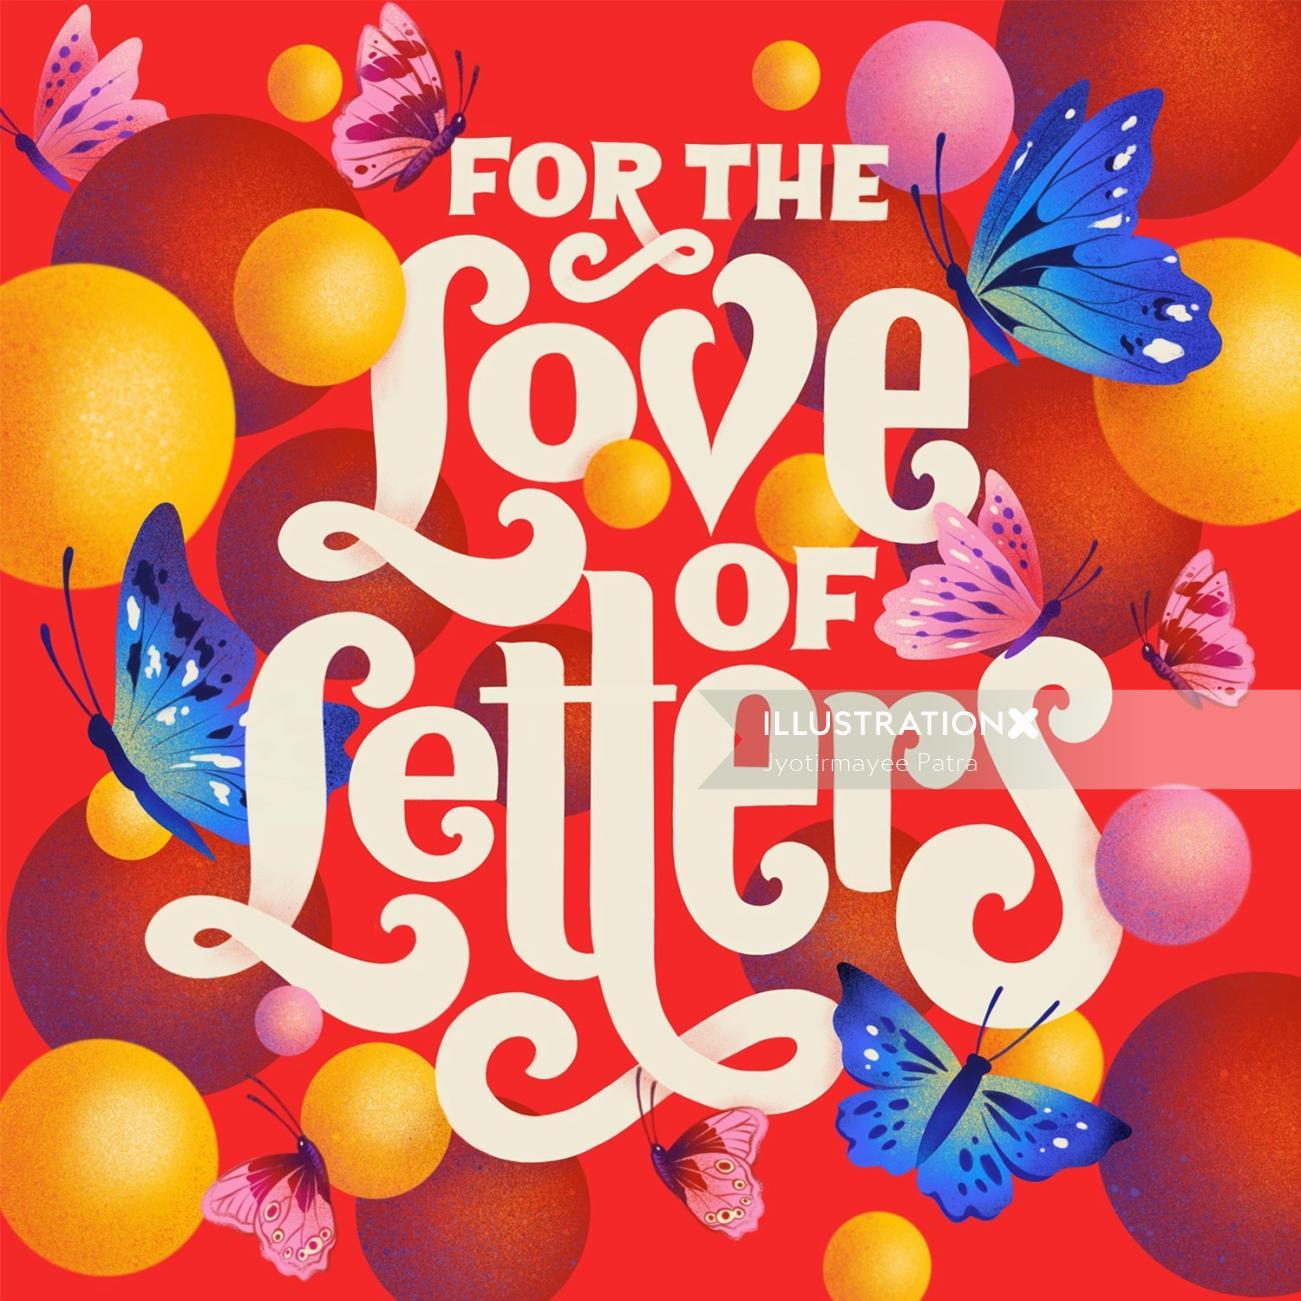 Digital illustration 'For the Love of Letters'